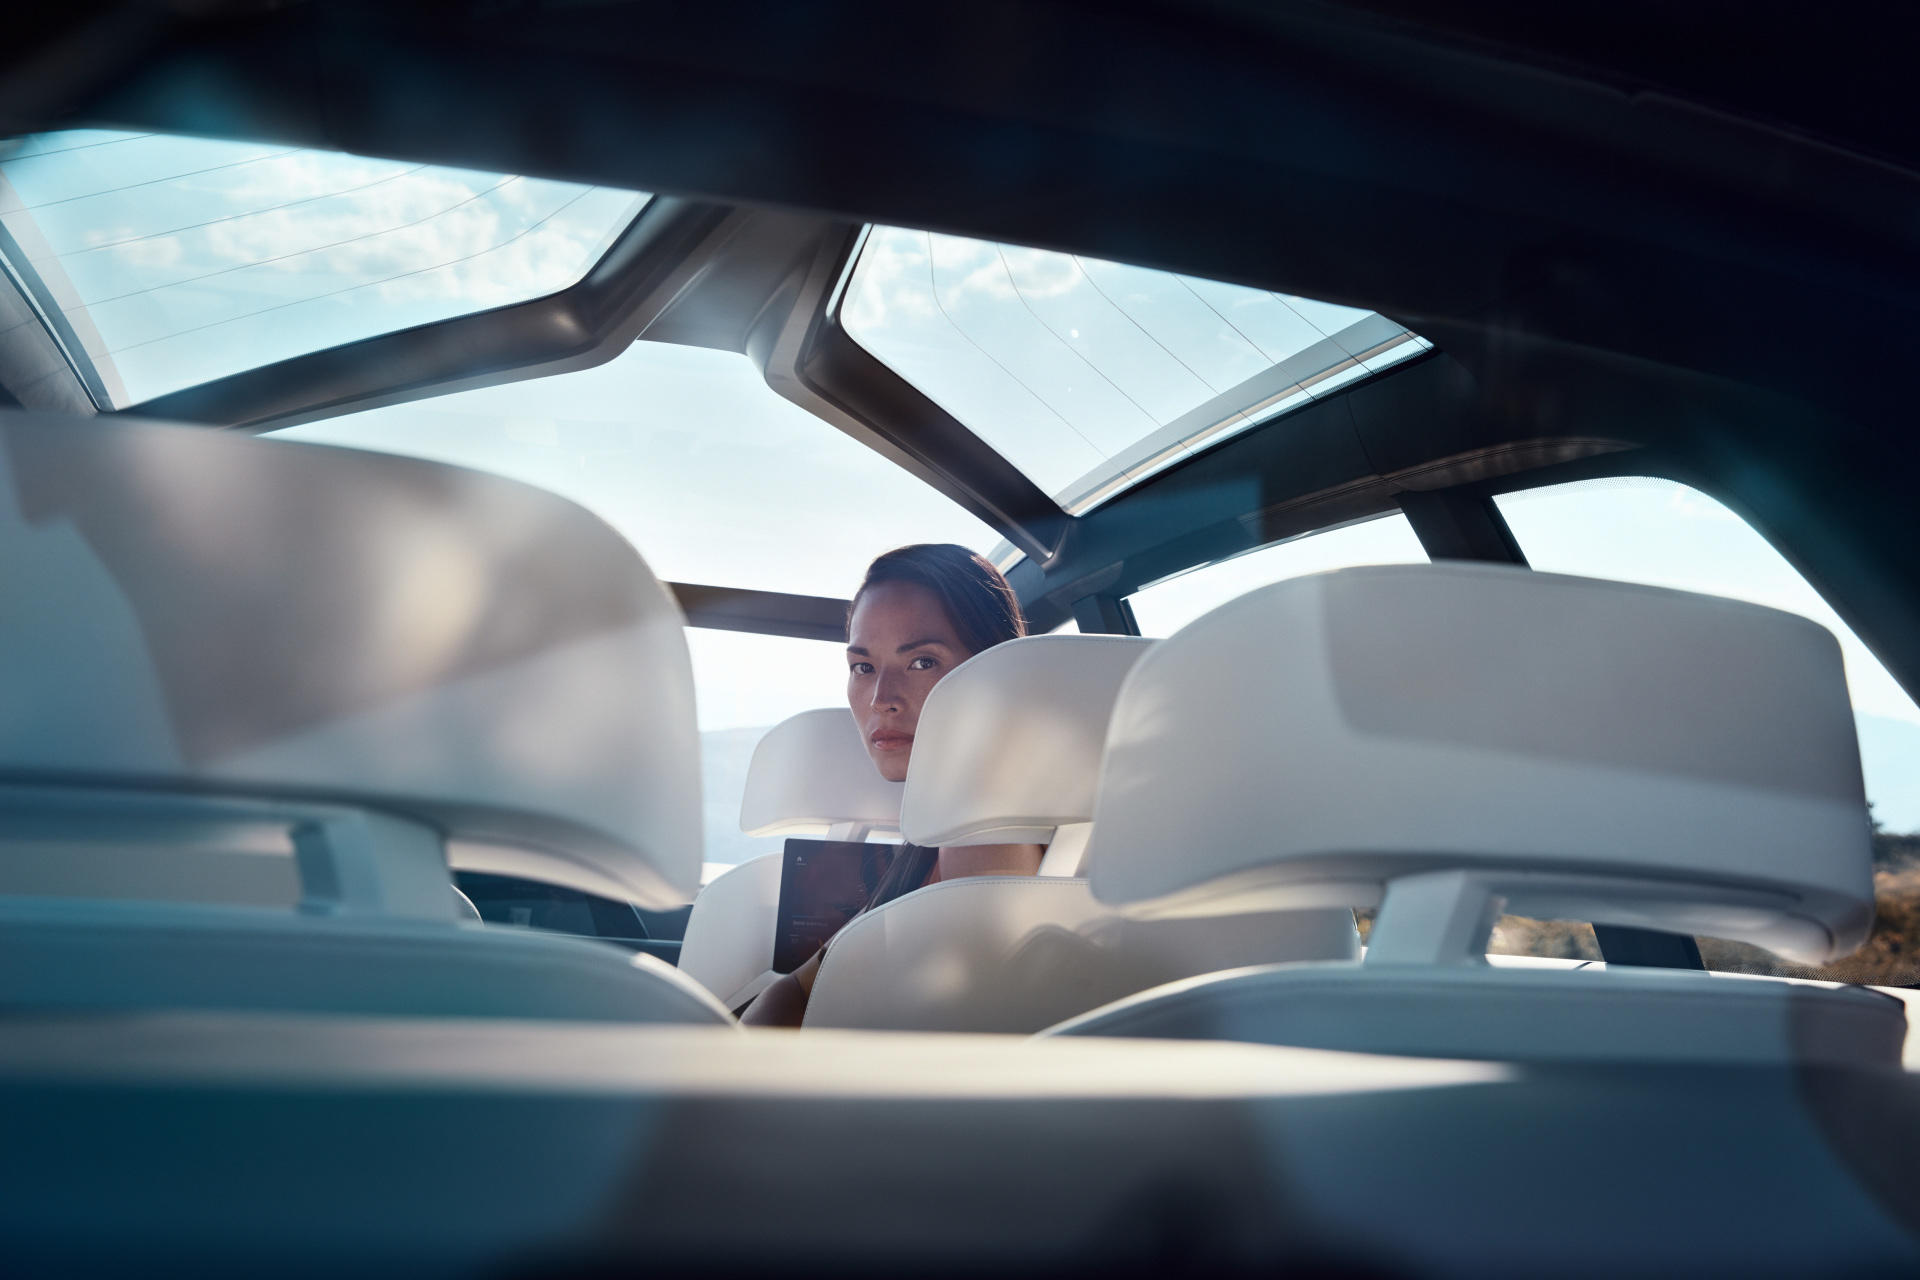 BMW-x7-concept-dm-2.jpg